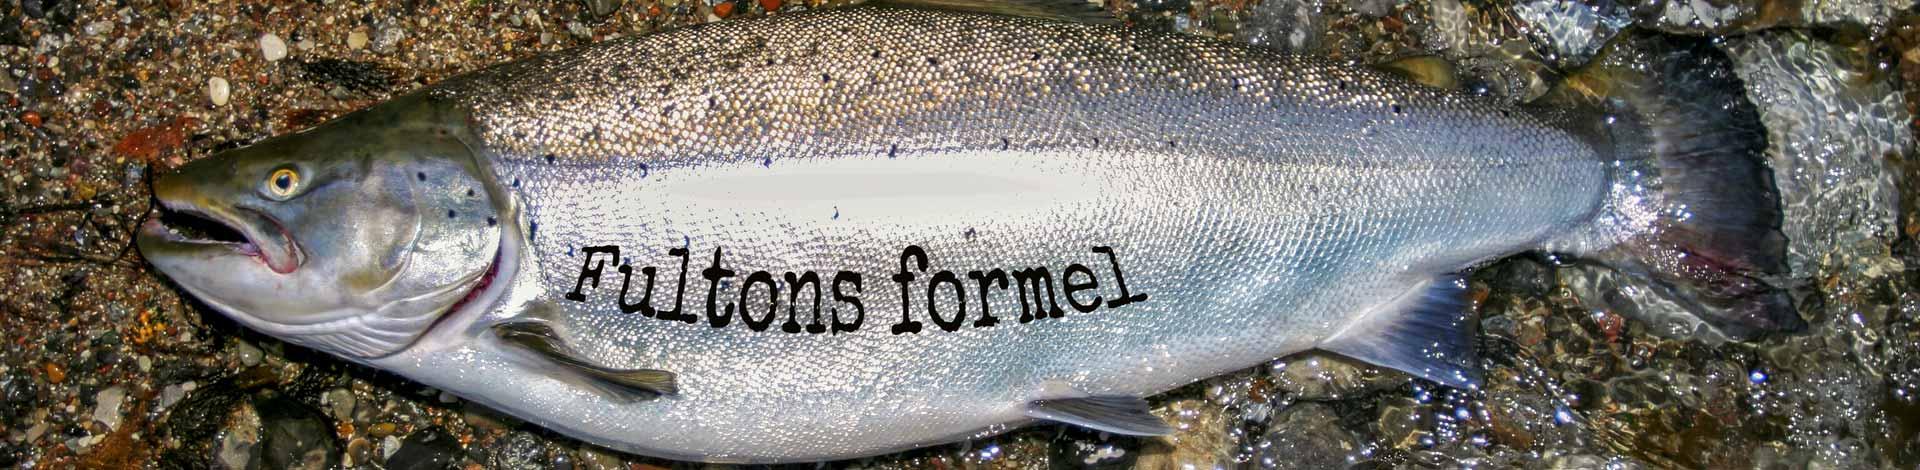 Fultons formel